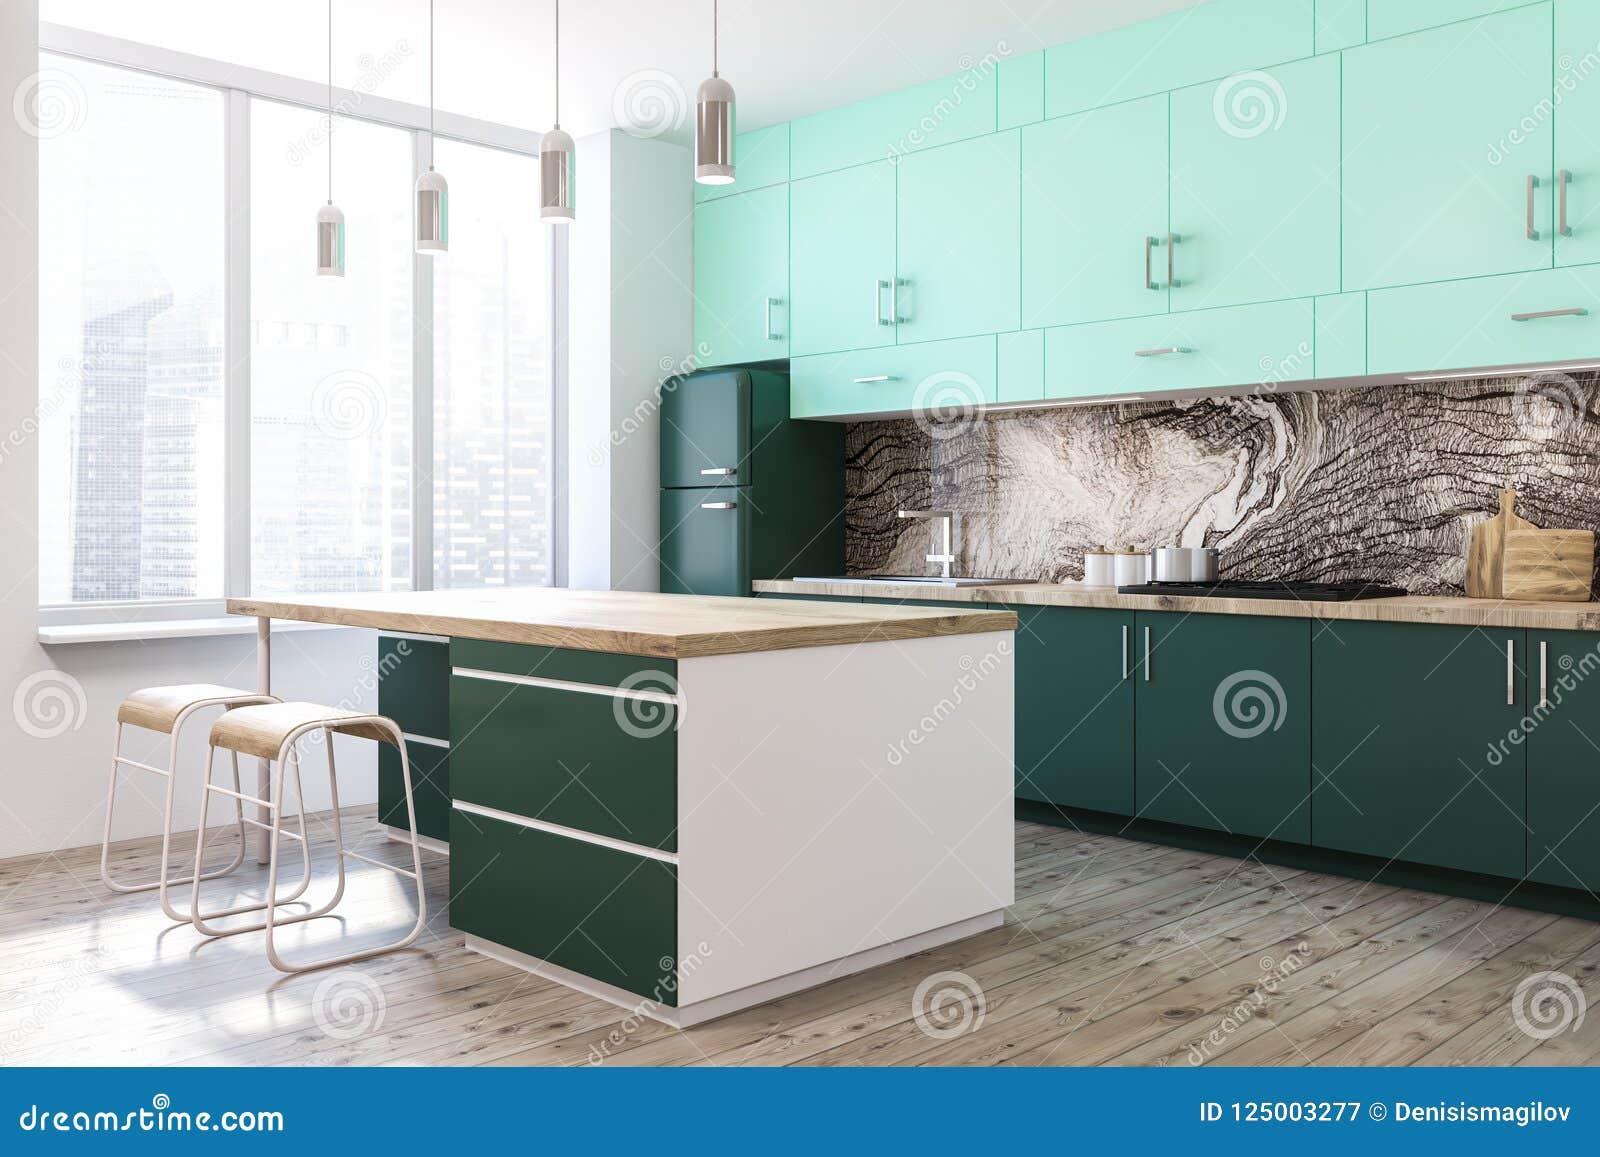 White Kitchen Green Countertops Island Side View Stock Illustration Illustration Of Flat Appliances 125003277